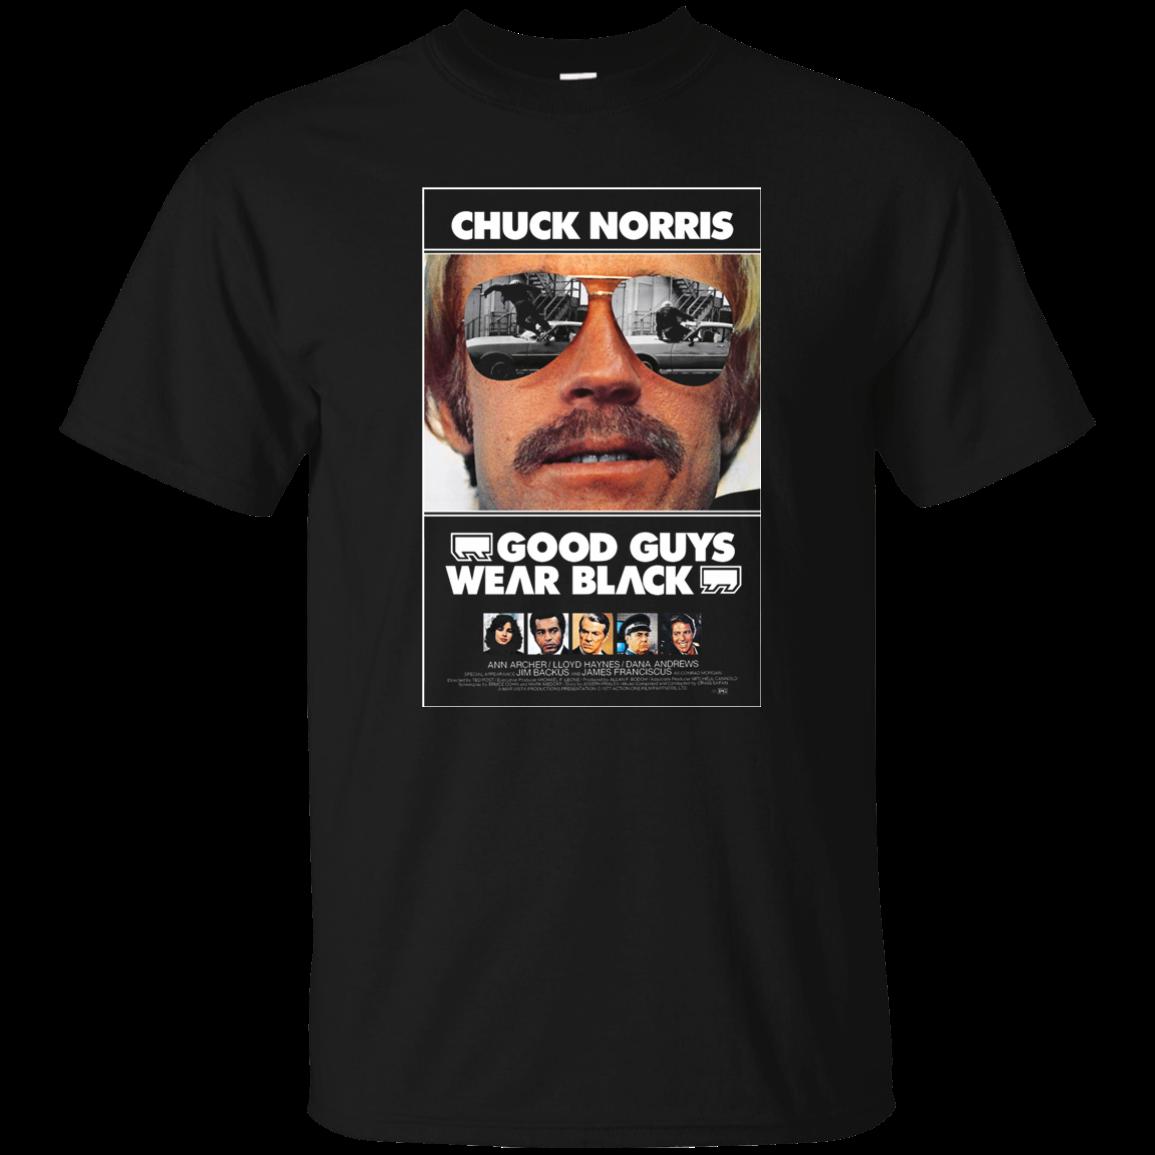 Good Guys Wear Black T Shirt Chuck Norris Retro S S - Good guys clothing